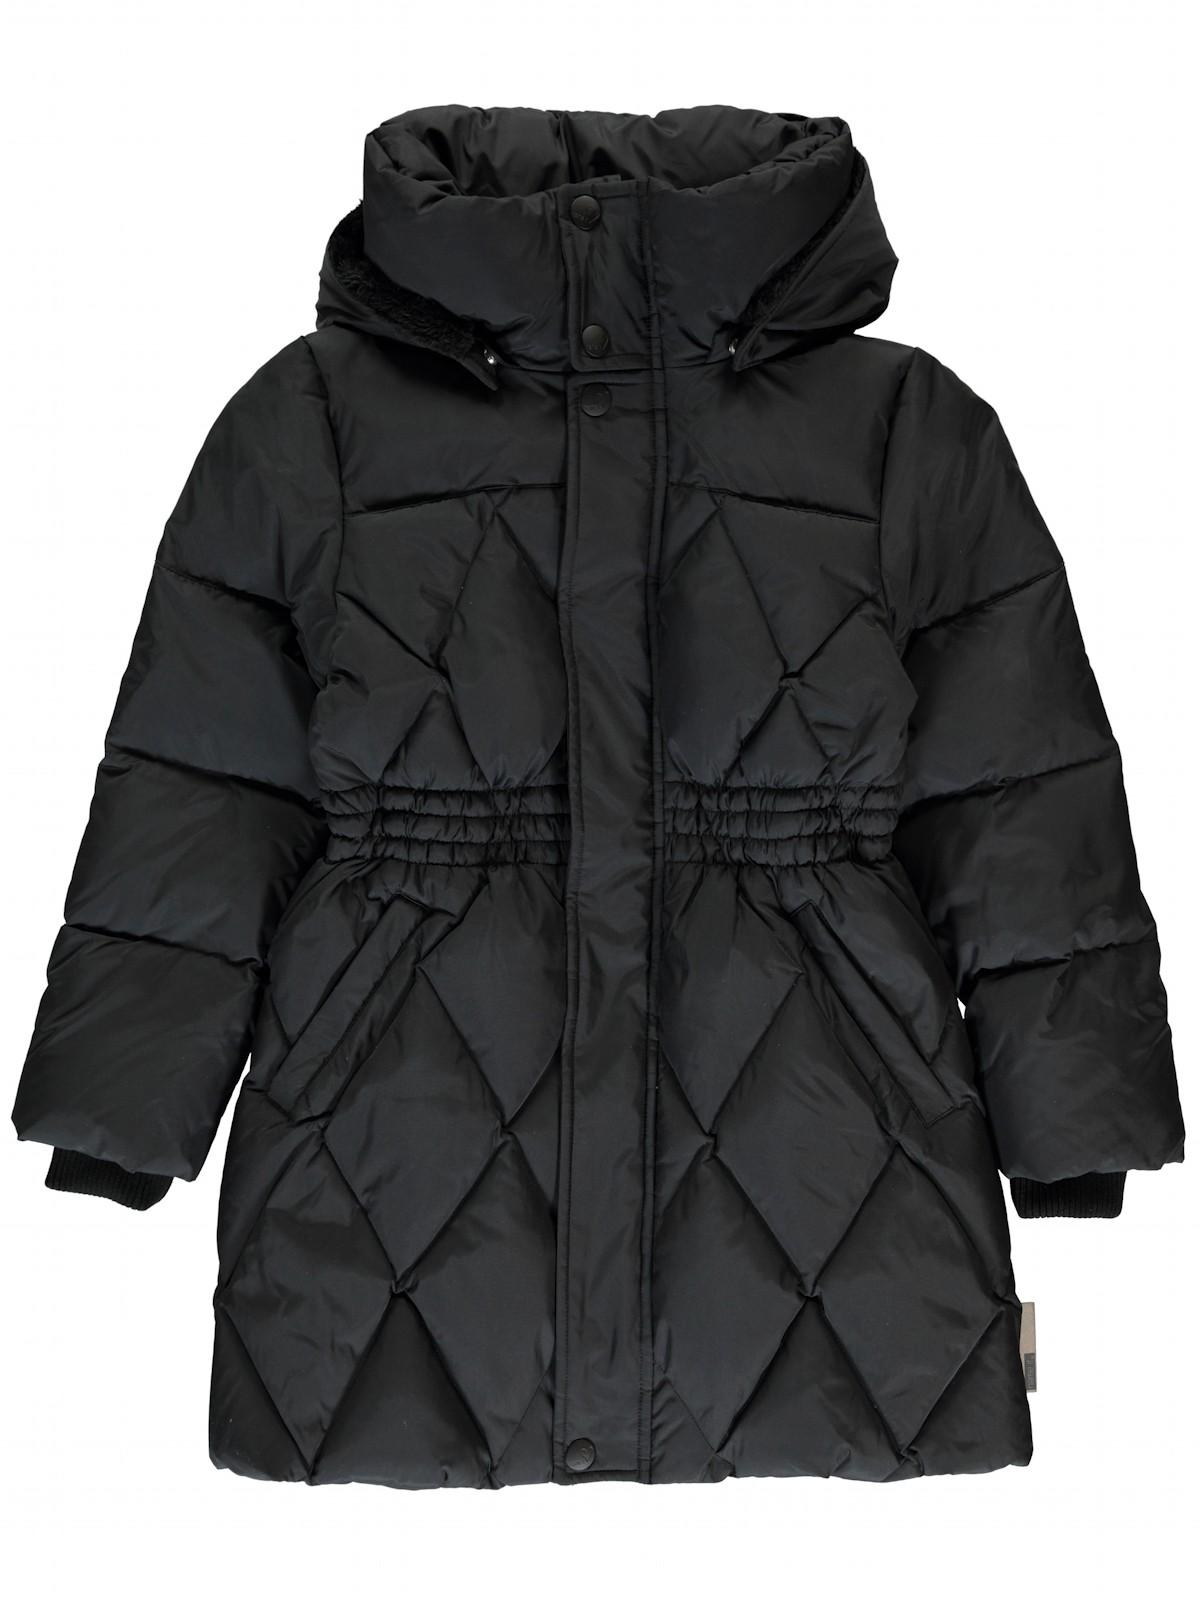 name it m dchen daunen mantel mit kapuze mocca schwarz. Black Bedroom Furniture Sets. Home Design Ideas